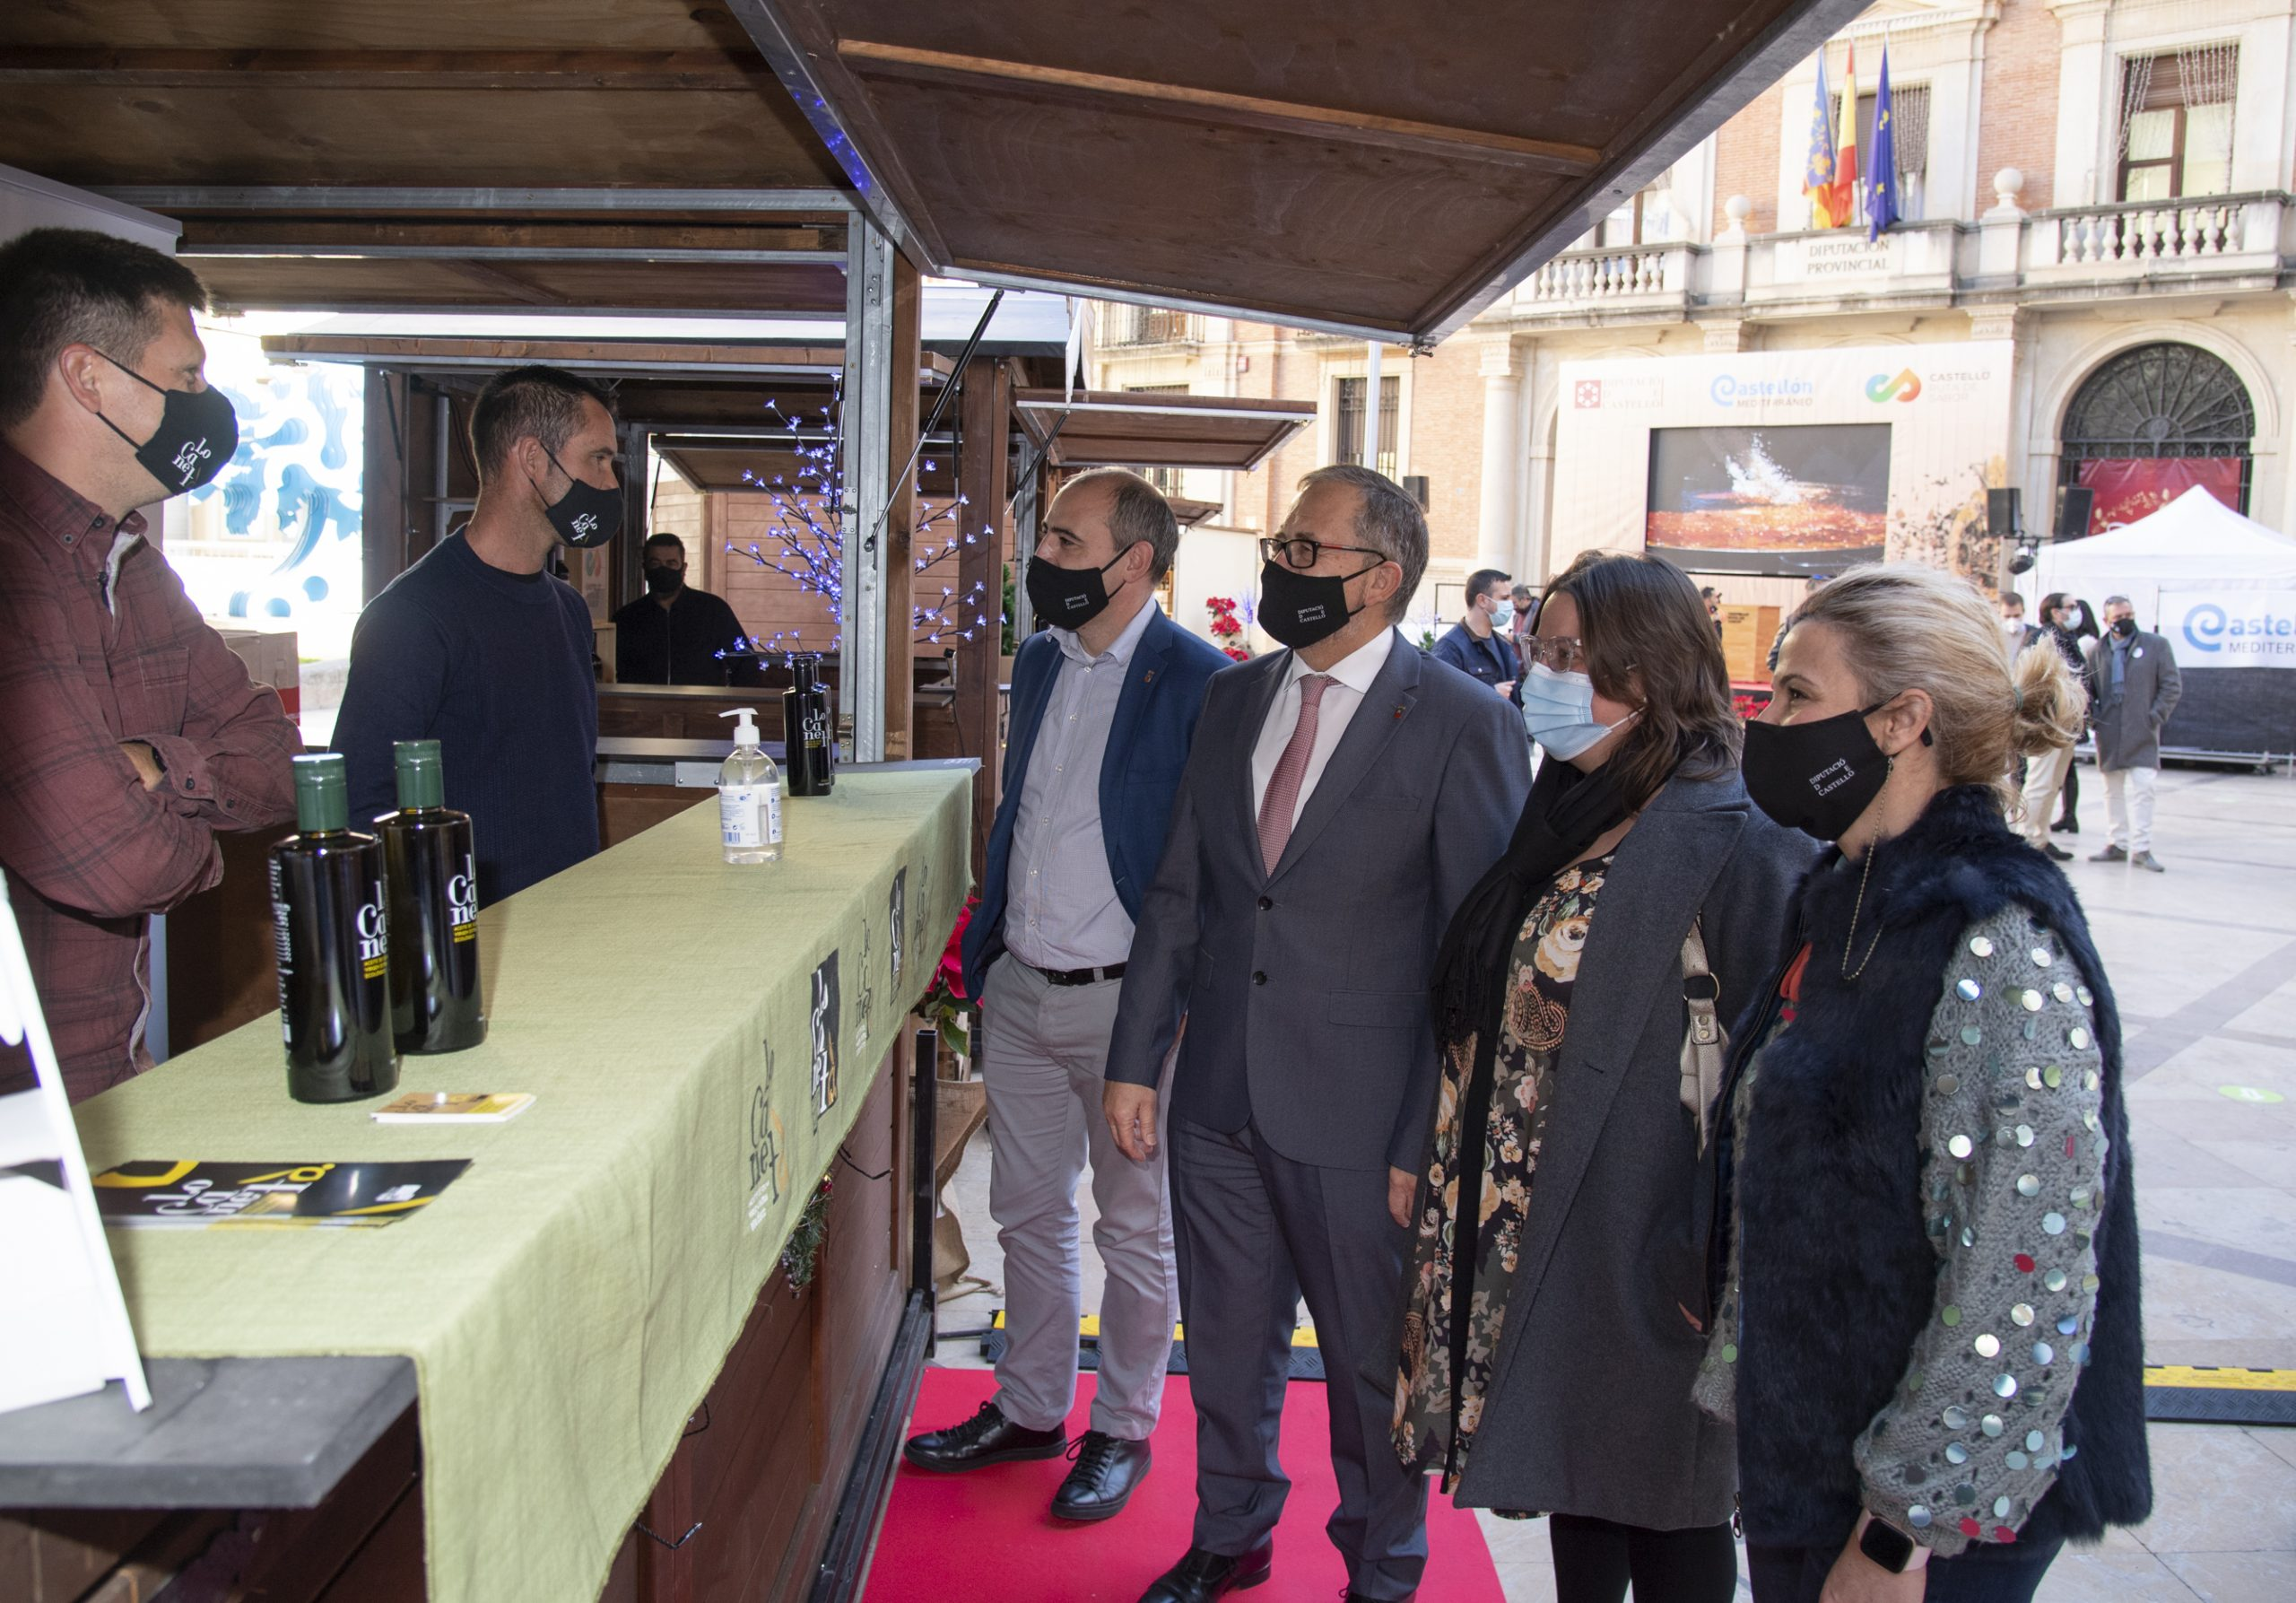 La Diputación de Castellón trabaja en la redefinición de 'Castelló Ruta de Sabor' como reclamo turístico gastronómico nacional e internacional